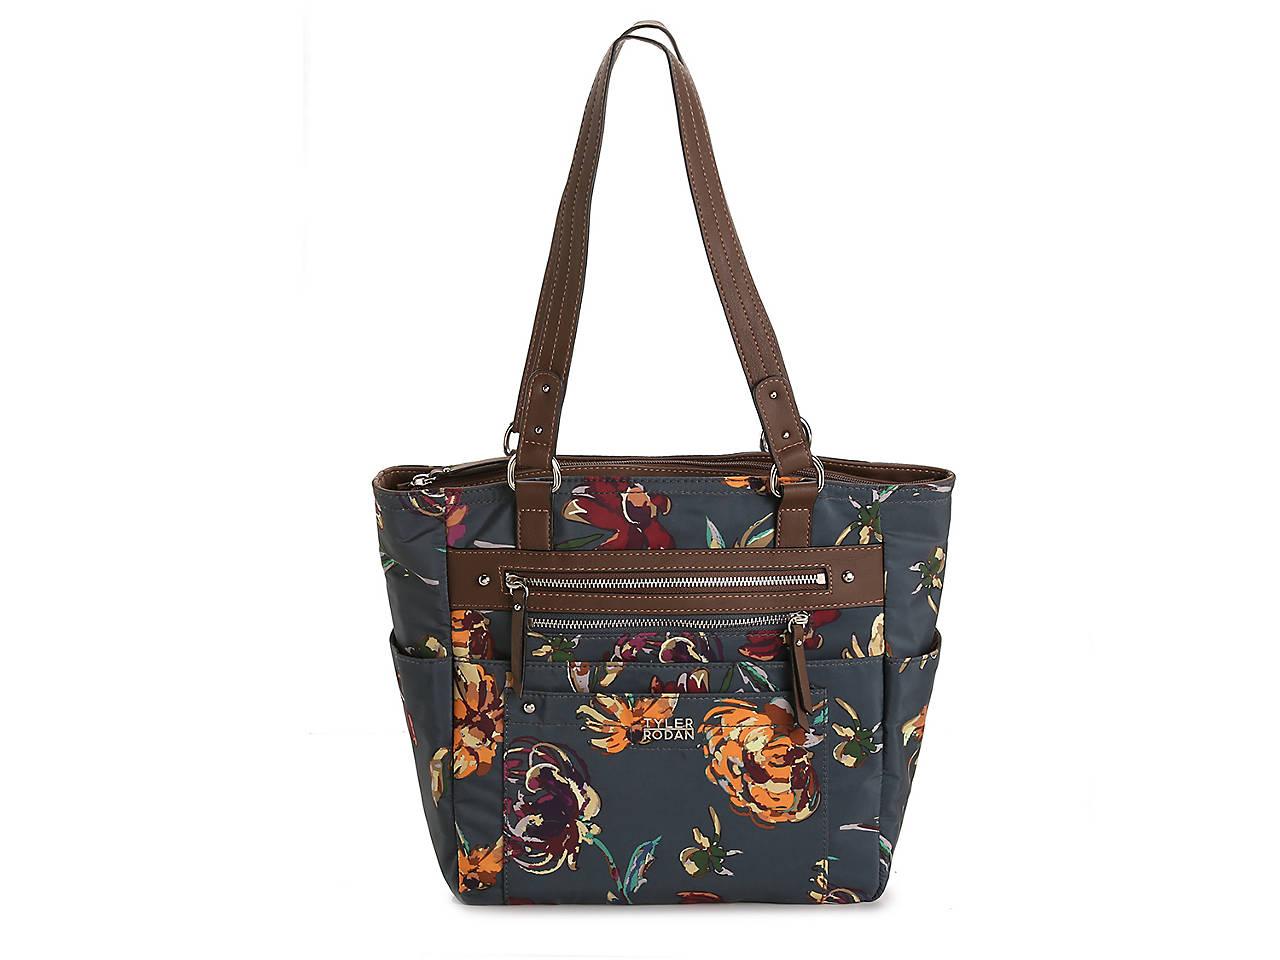 Tyler Rodan Cannon Shoulder Bag Womens Handbags Accessories Dsw